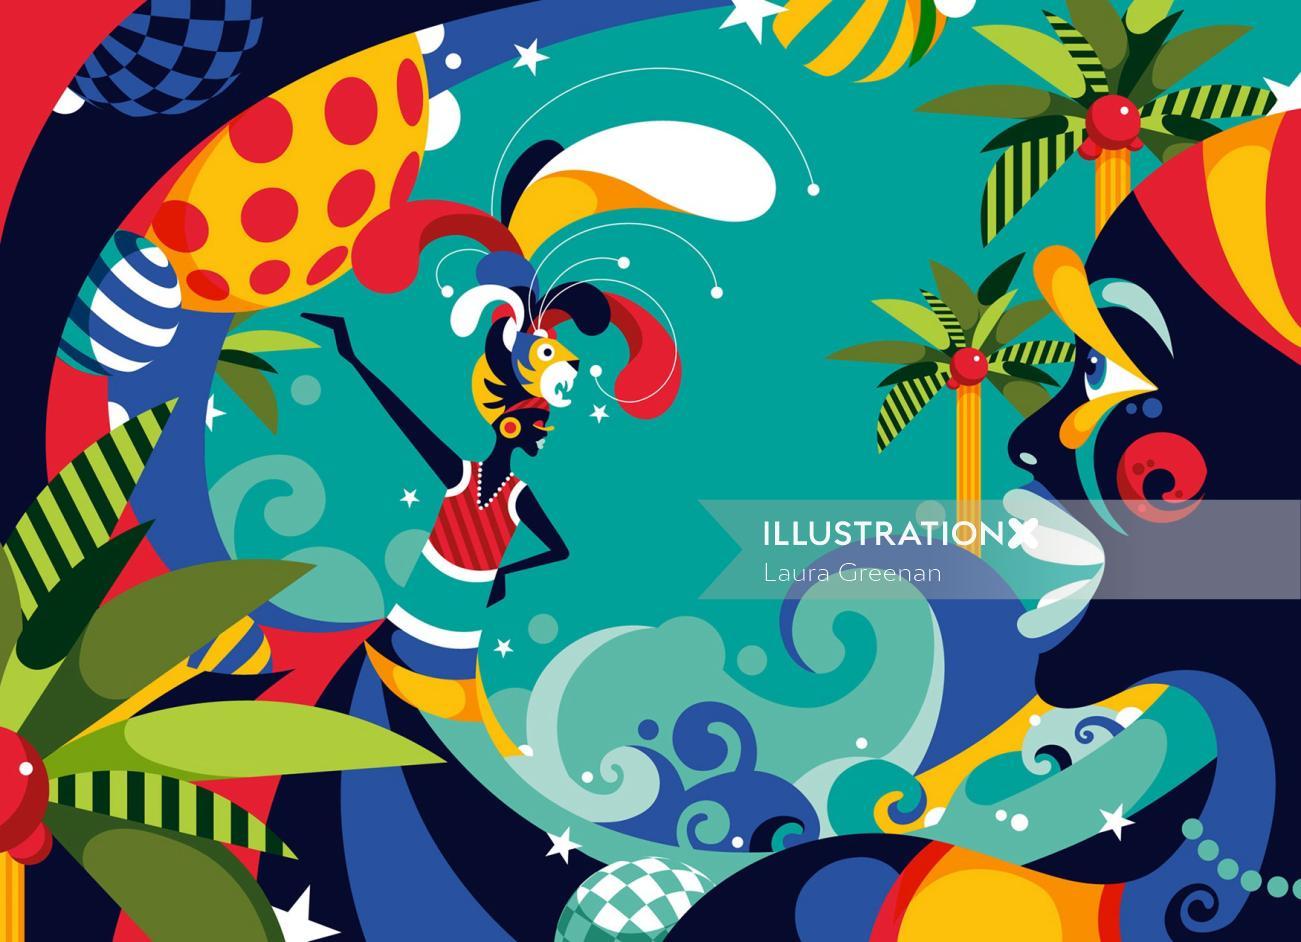 Wall Street Journal Haiti Carnival Travel Holiday poster